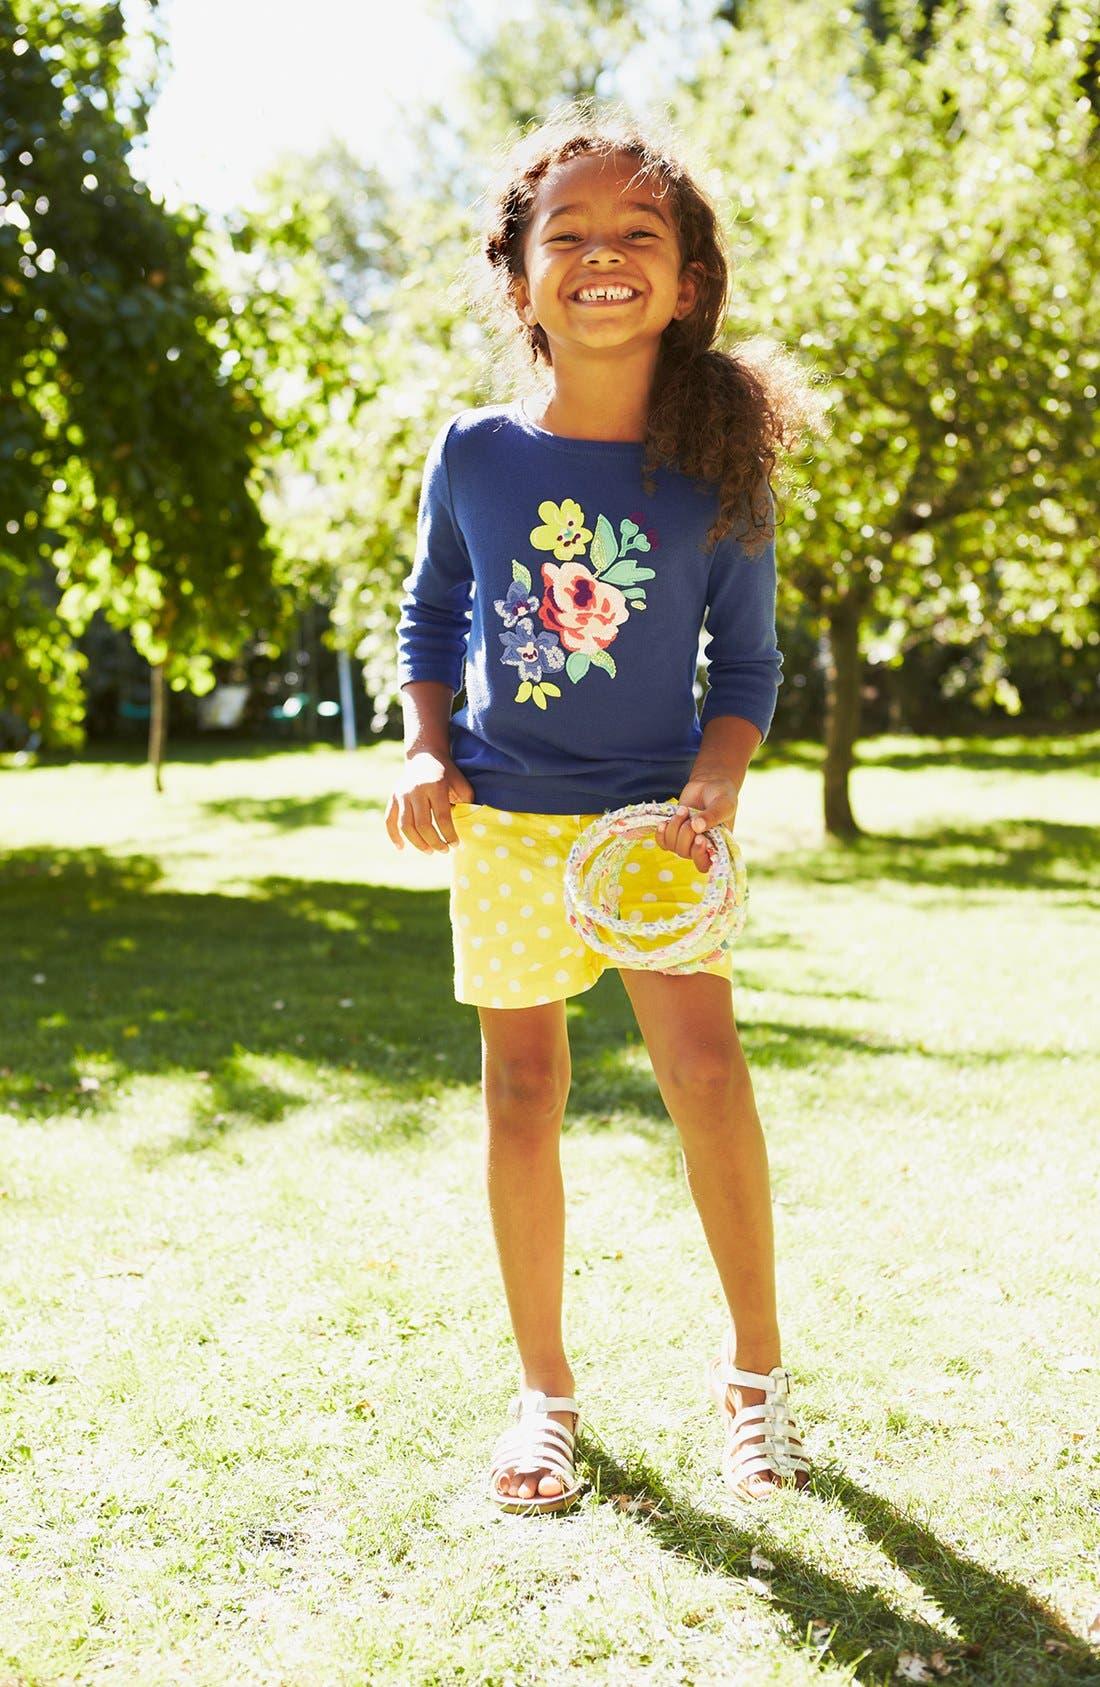 Alternate Image 2  - Mini Boden 'Twinkly' Long Sleeve Tee (Toddler Girls, Little Girls & Big Girls)